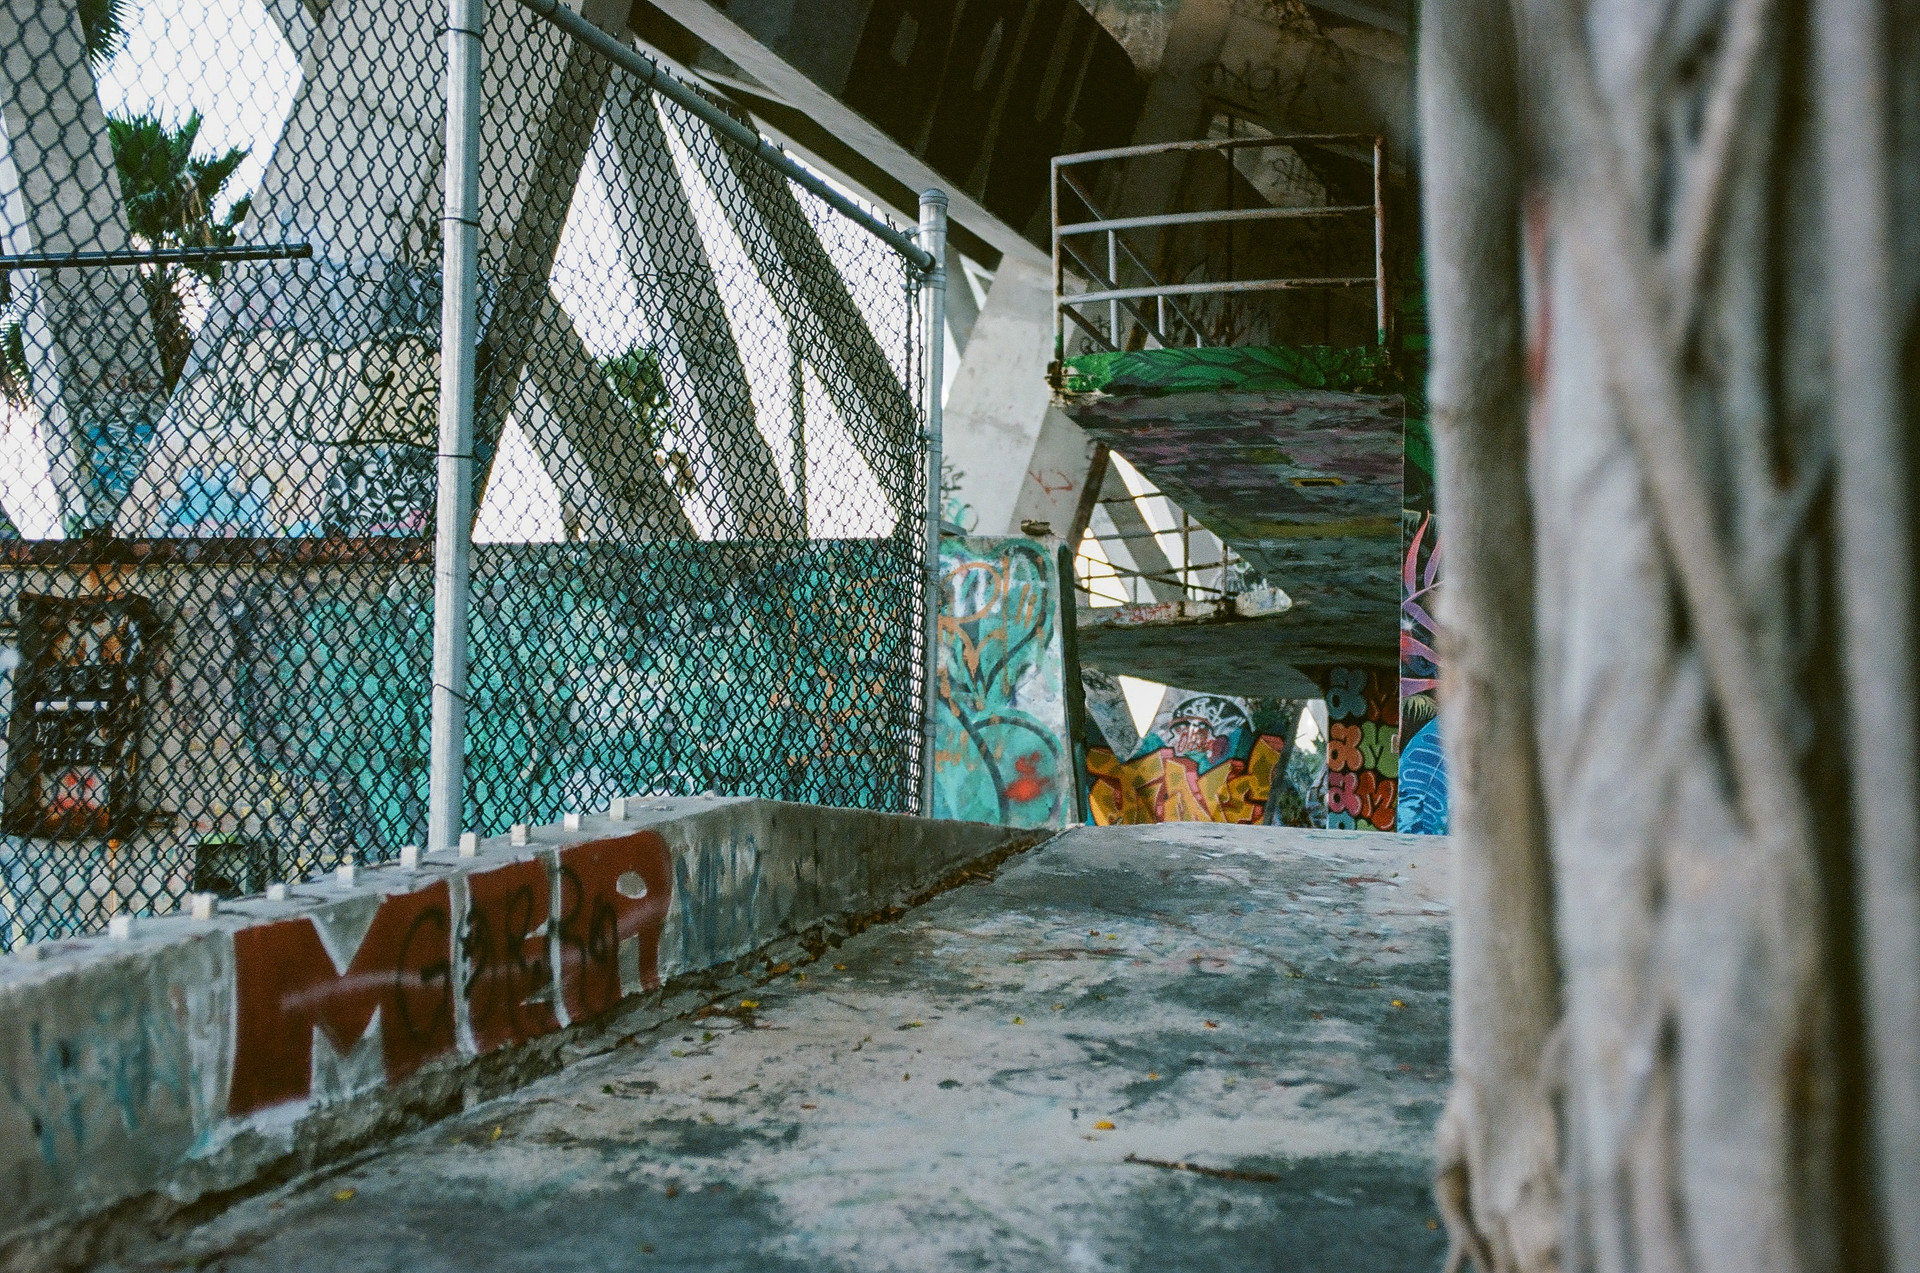 Miami Marine Stadium | Key Biscayne, Miami, FL